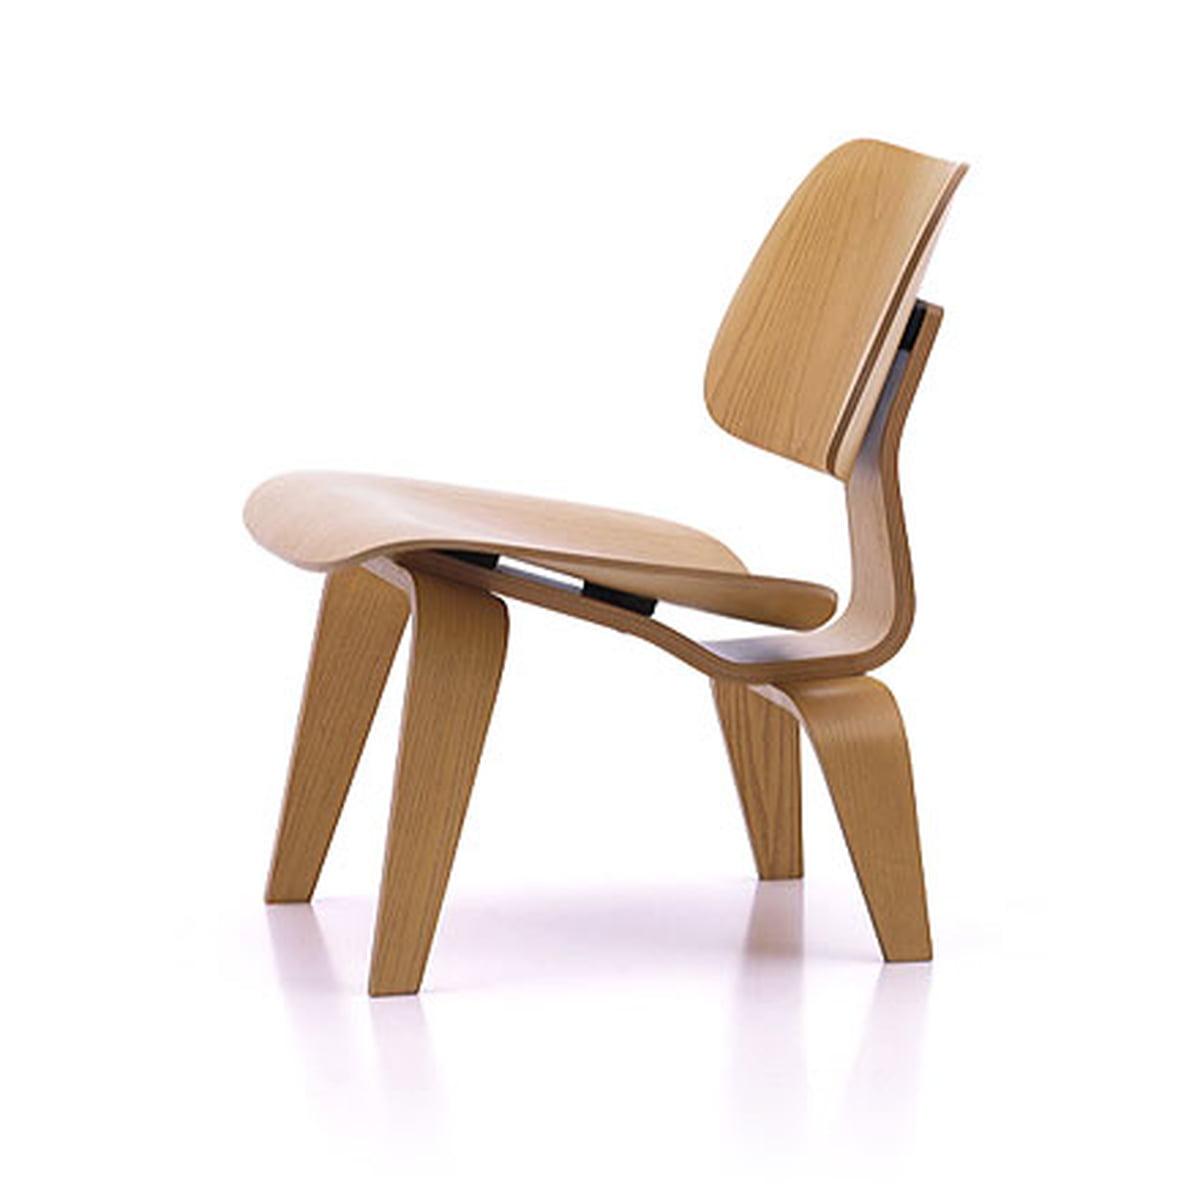 Plywood Group LCW Stuhl von Vitra   Connox